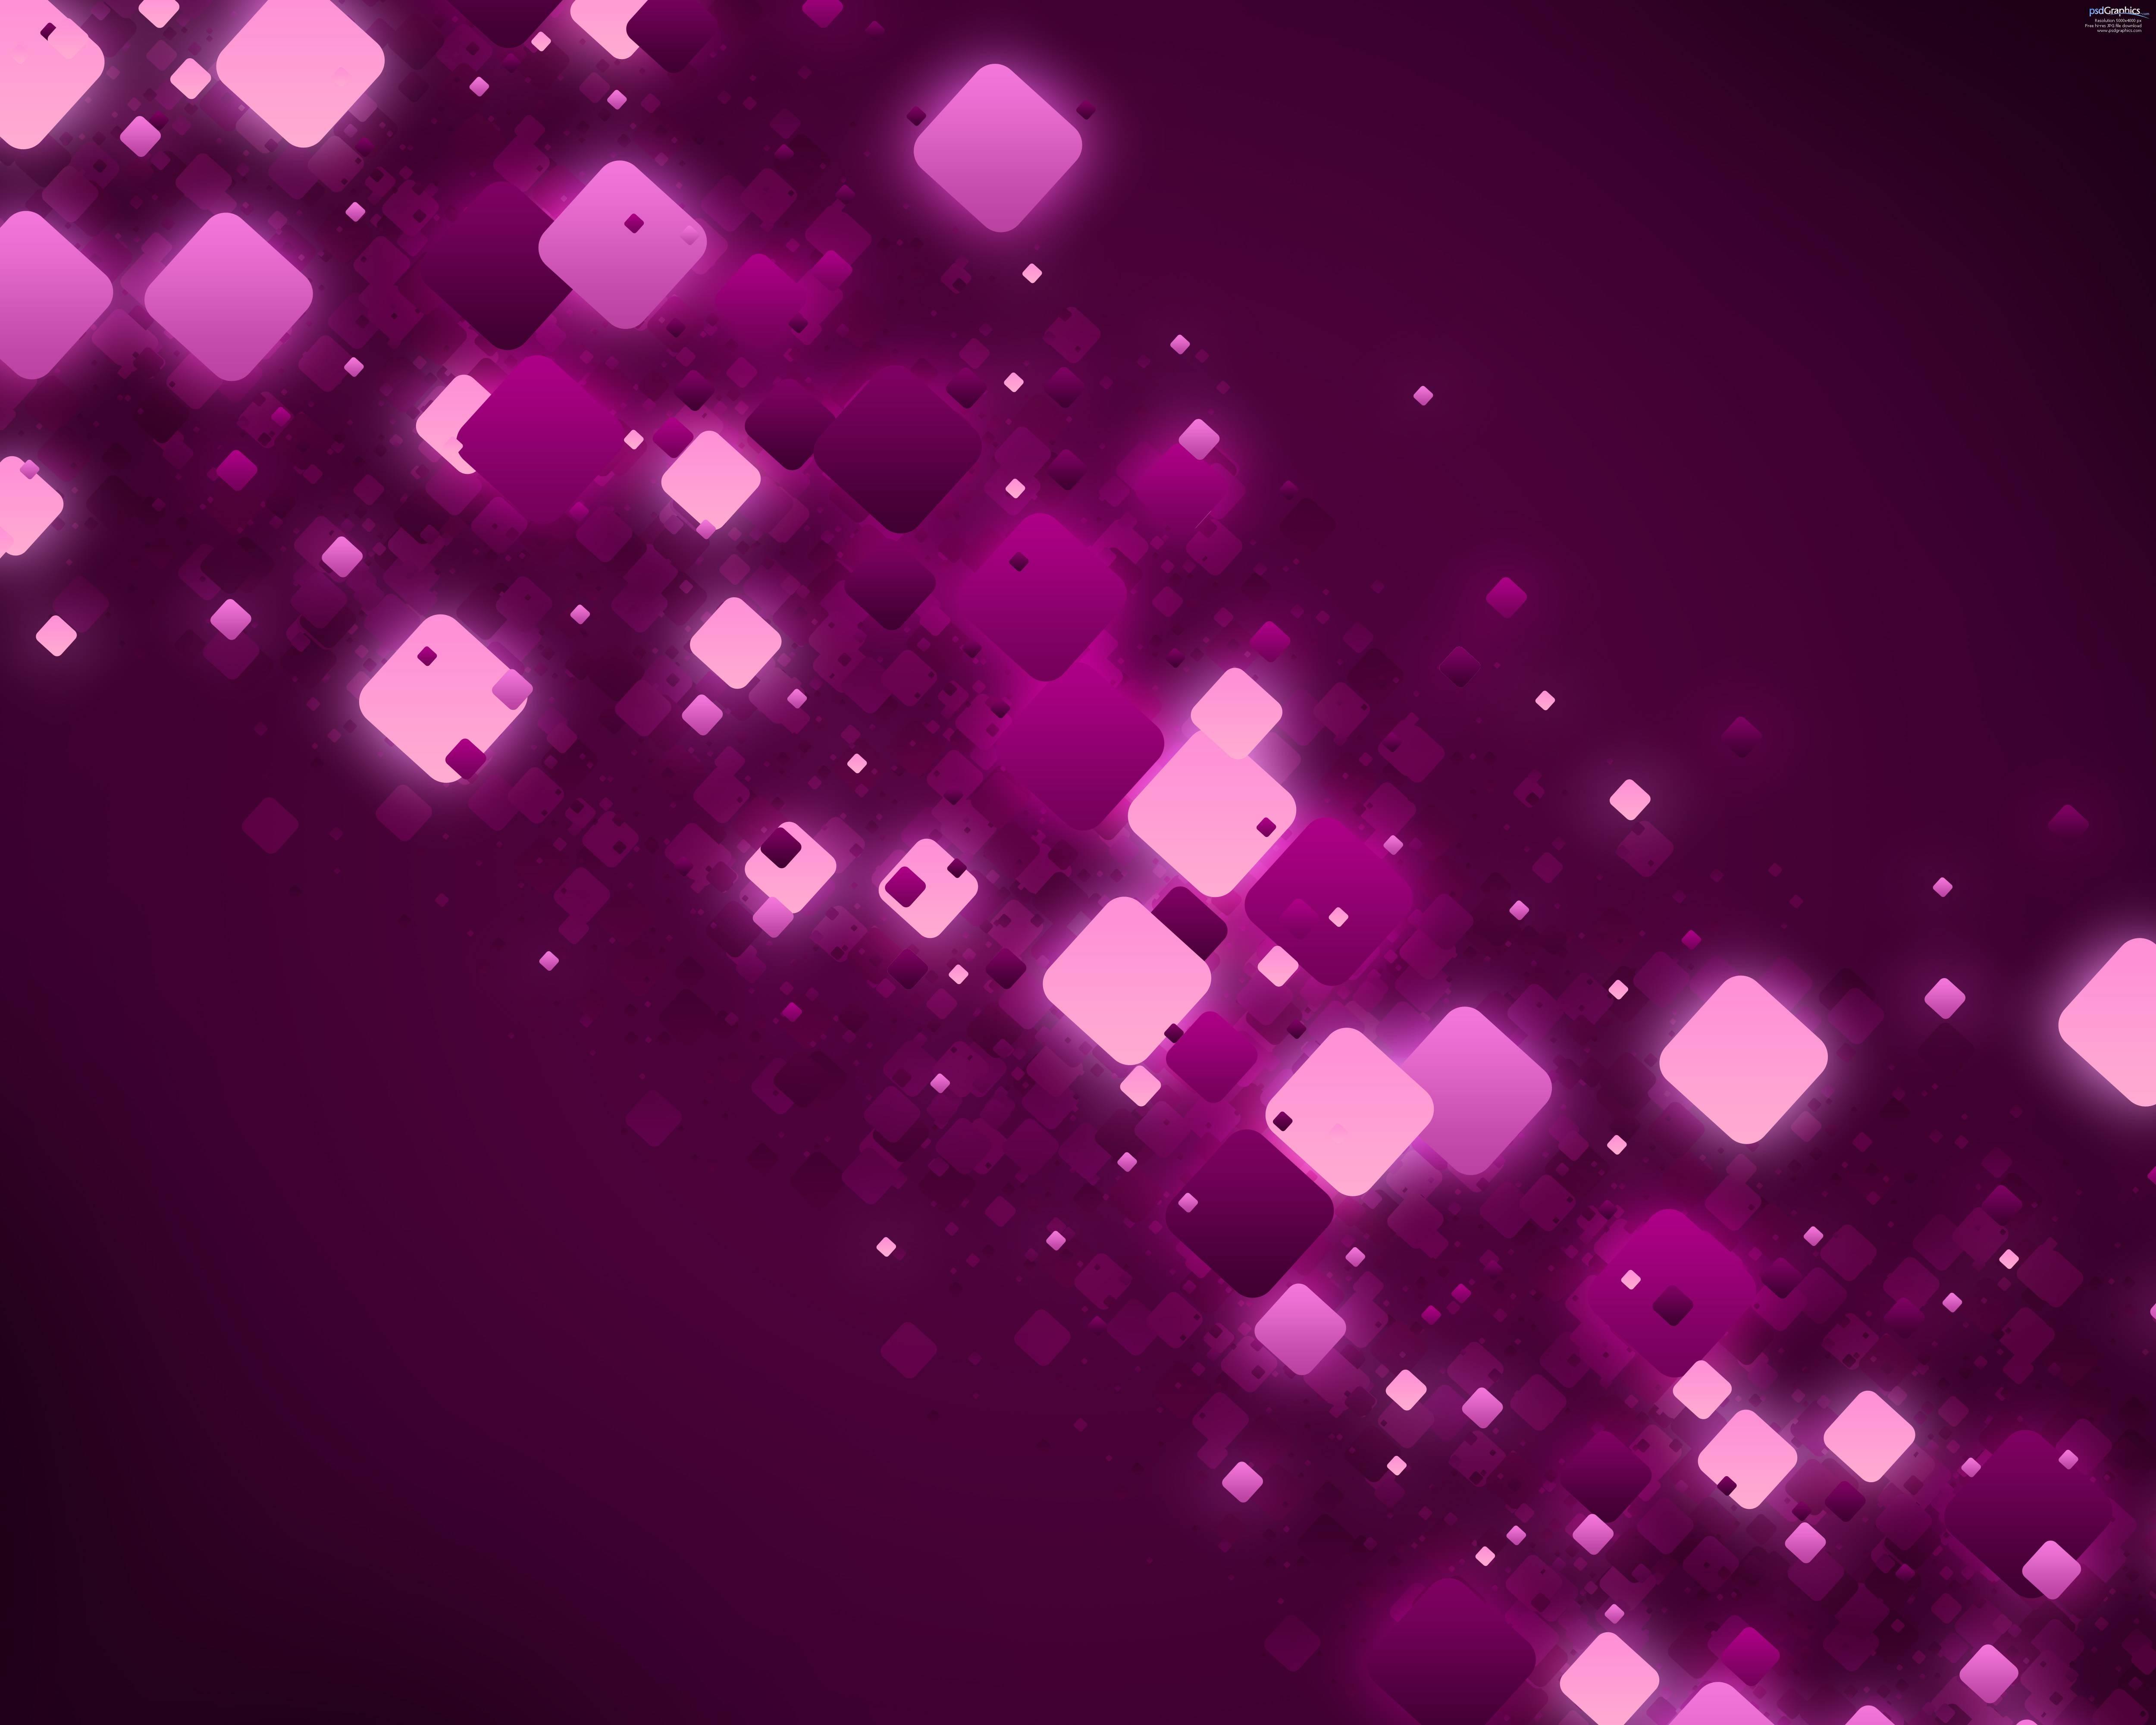 Backgrounds Purple Wallpaper Cave